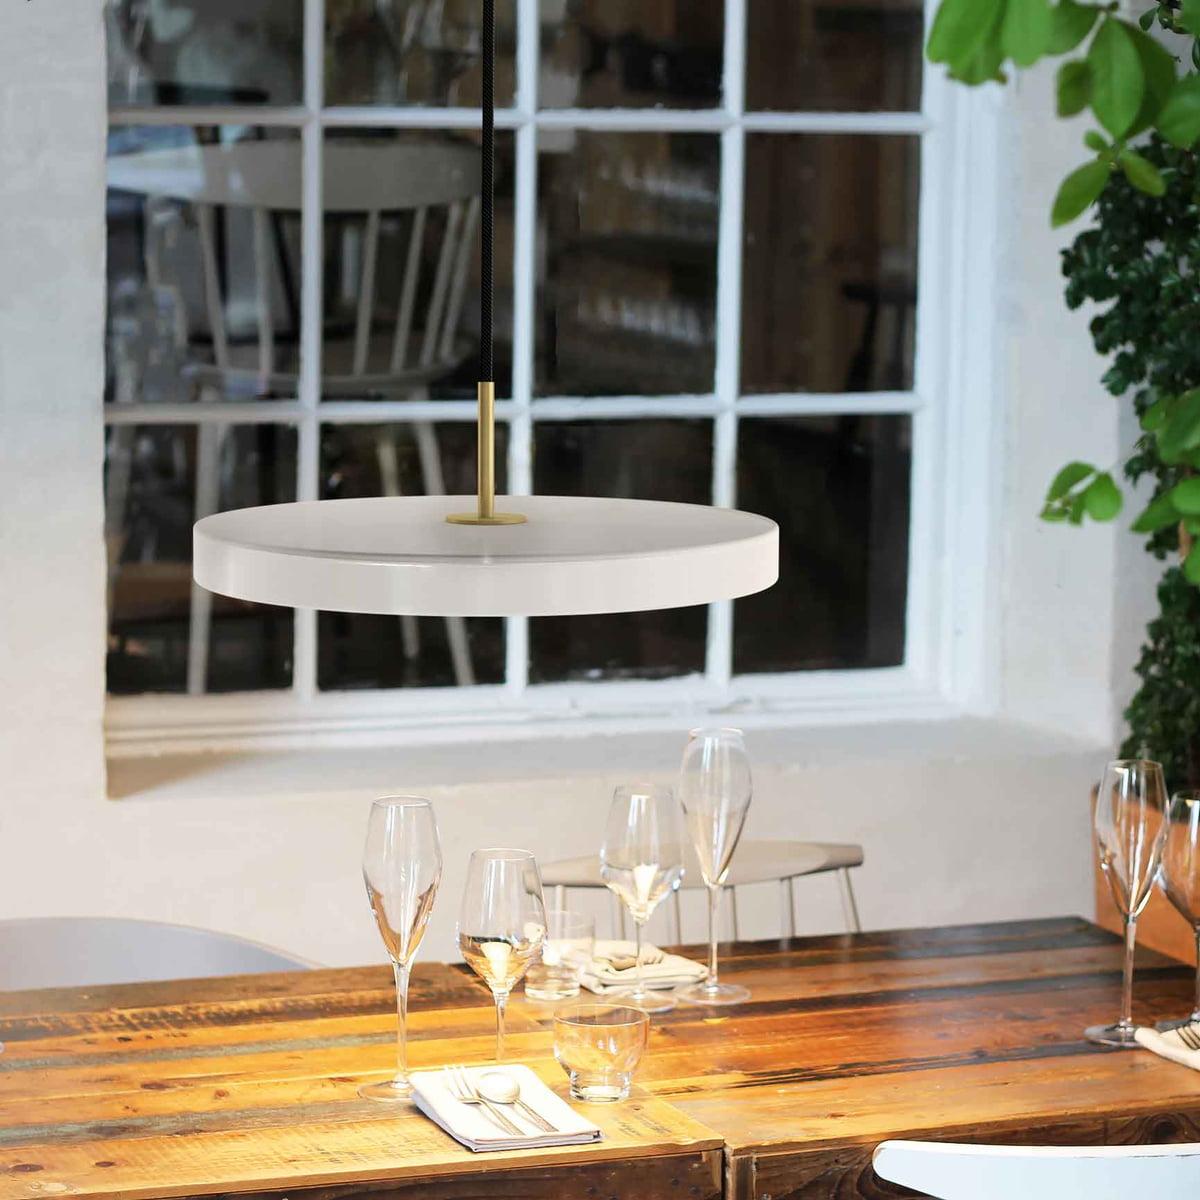 umage-Asteria-Pendelleuchte-LED-pearl-Situation-Tisch.jpg